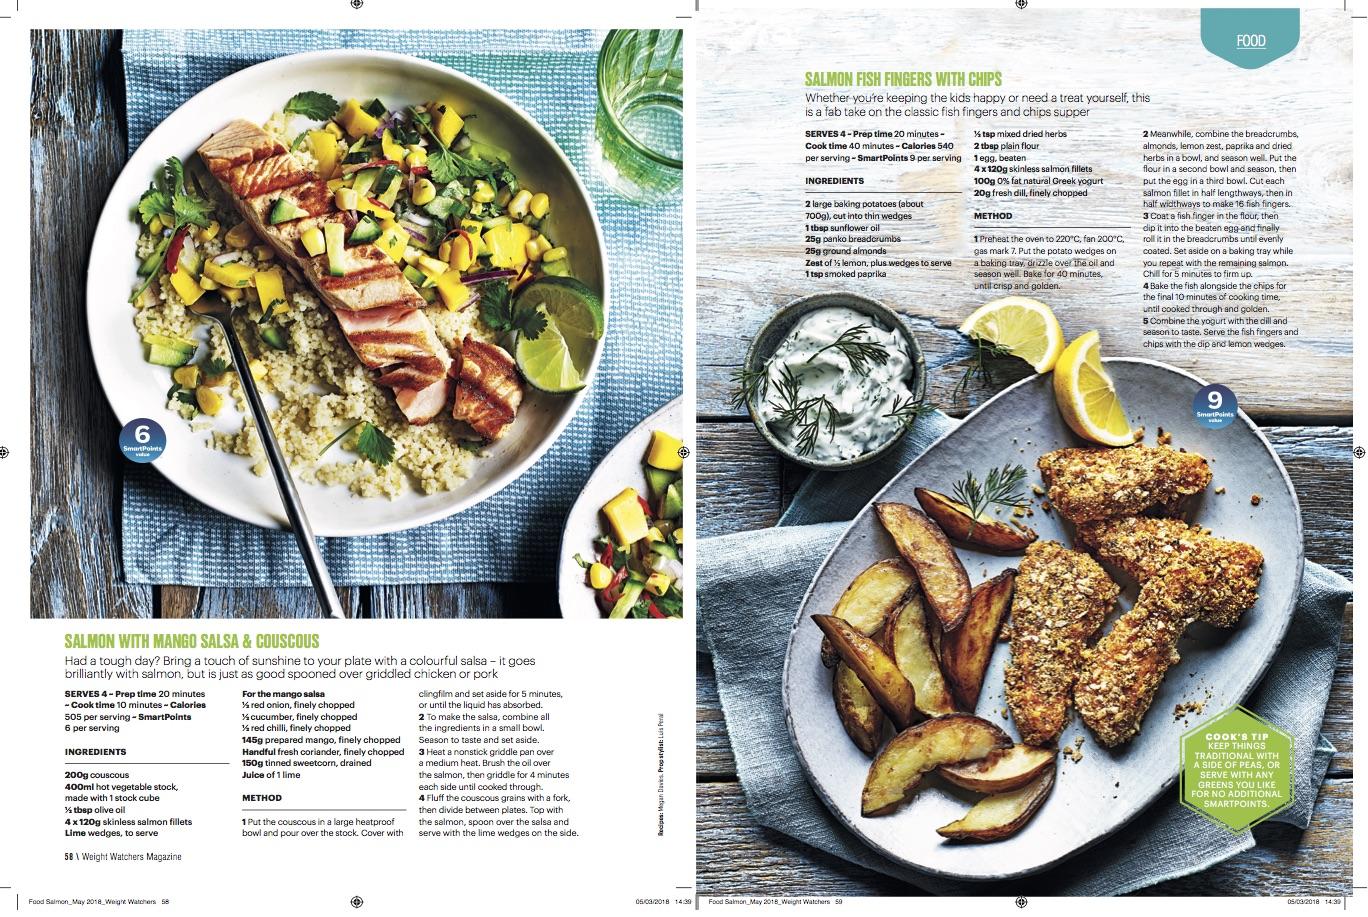 Publication: Weight Watchers magazine May 2018  Photographer: Kris Kirkham  Food stylist: Polly Webb-Wilson  Prop stylist: Luis Peral